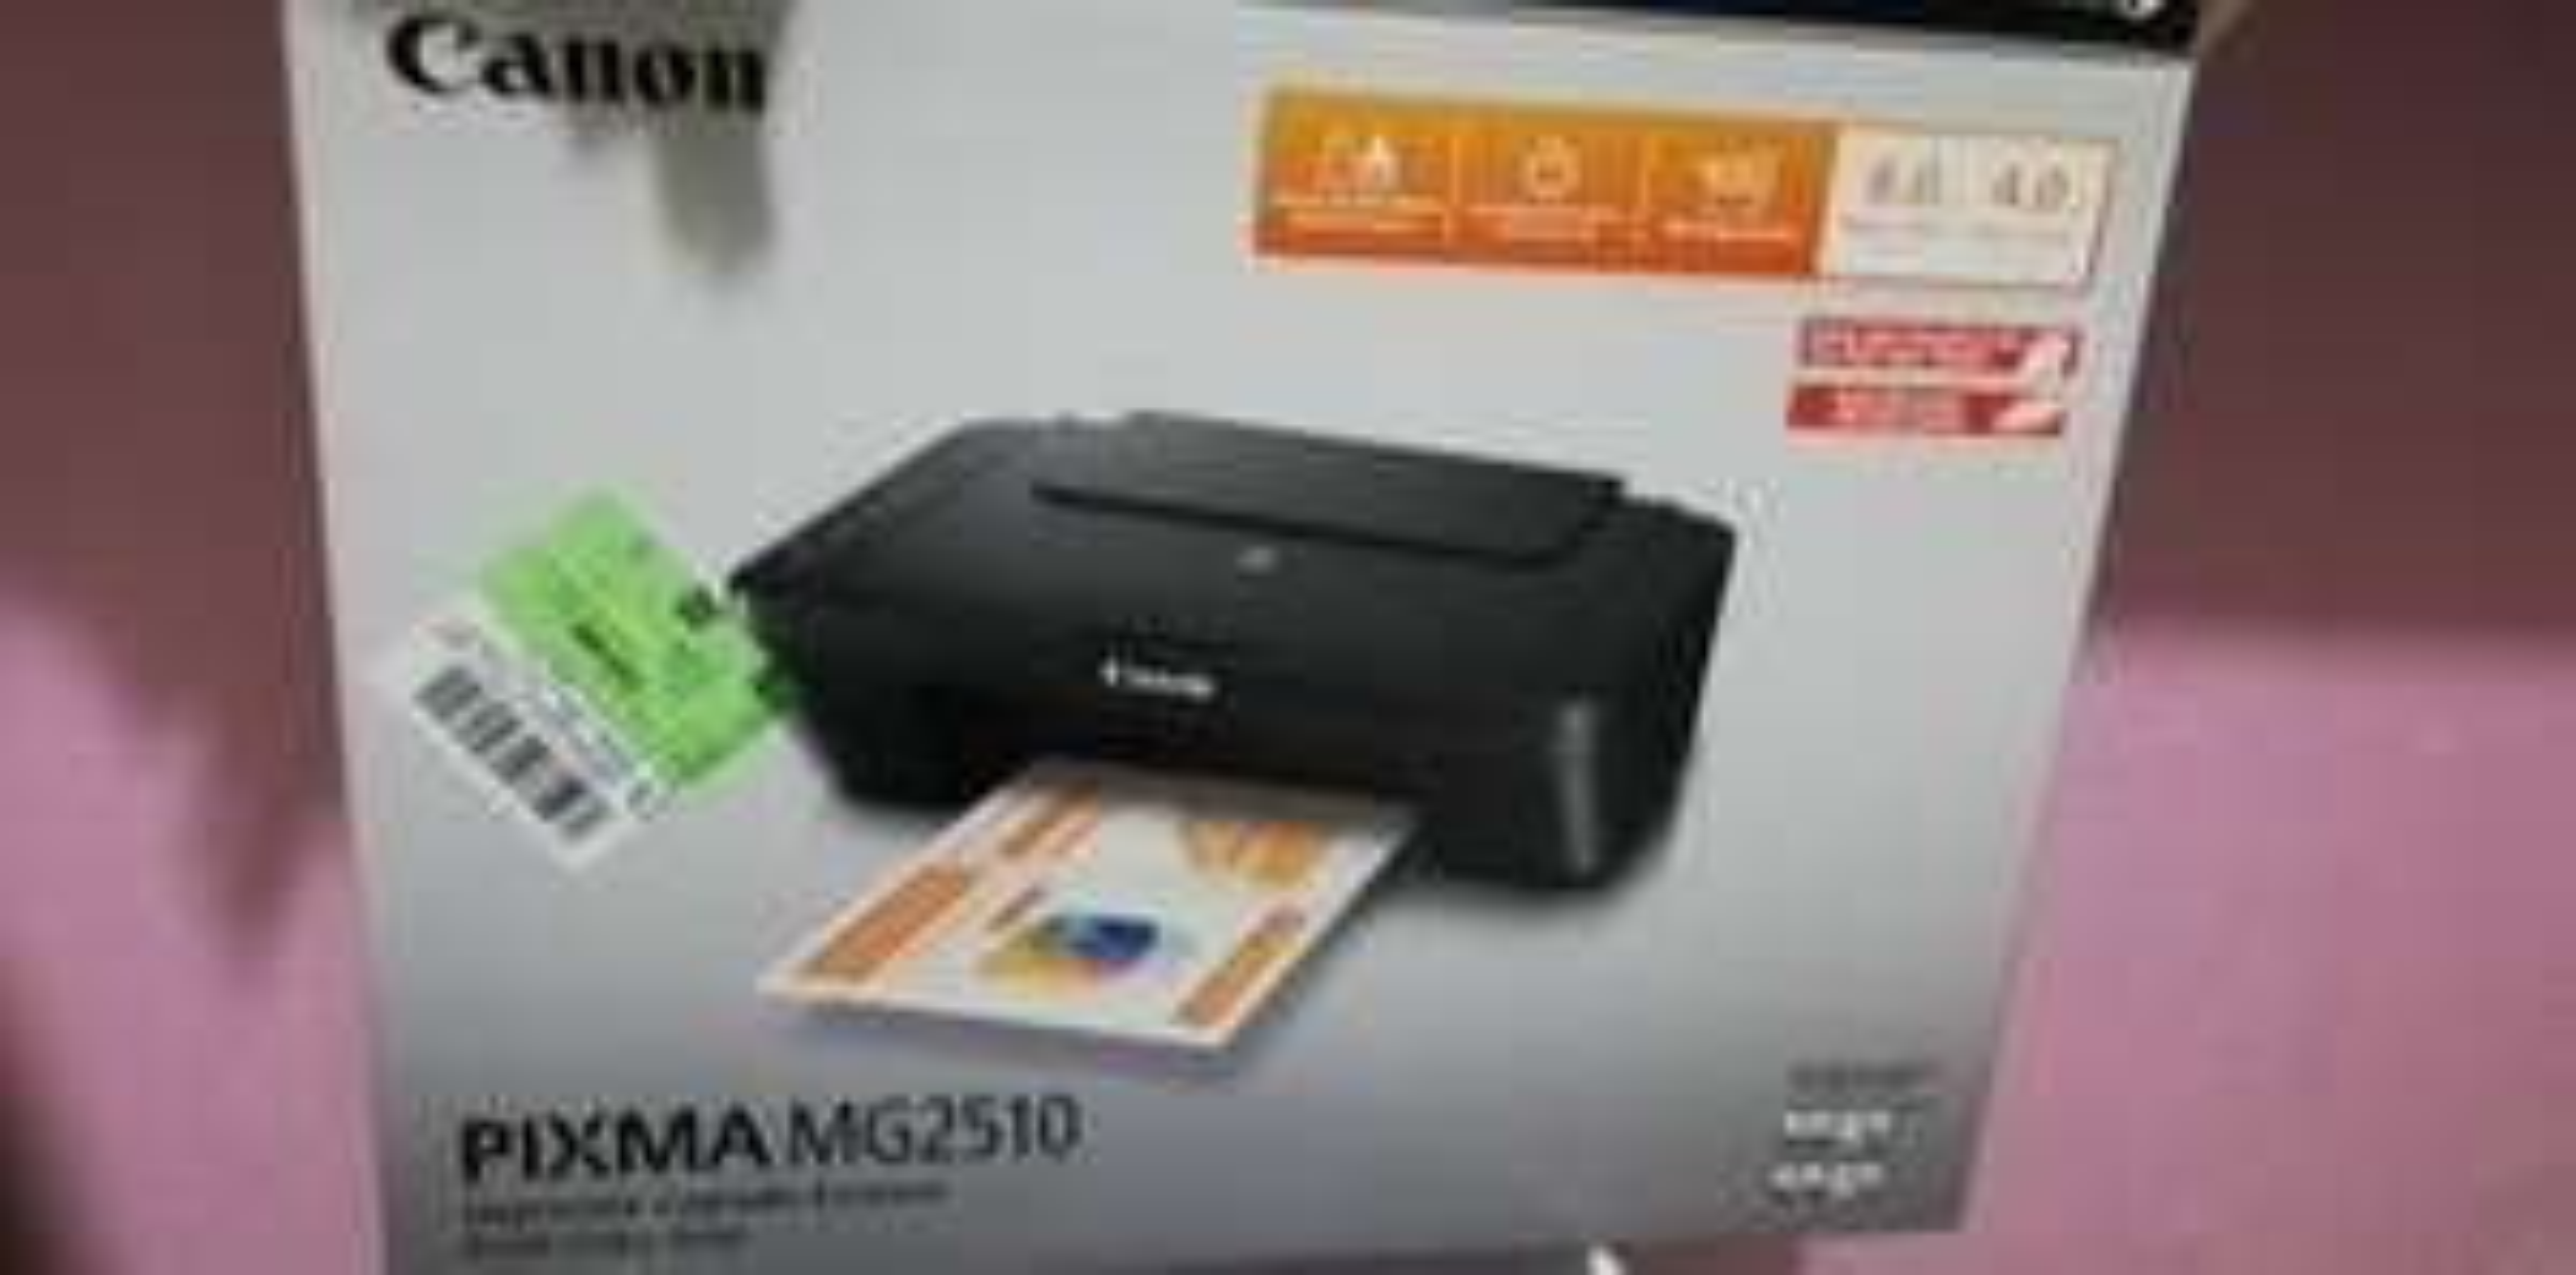 Bodega Aurrera: Impresora multifuncional Canon Pixma MG2510